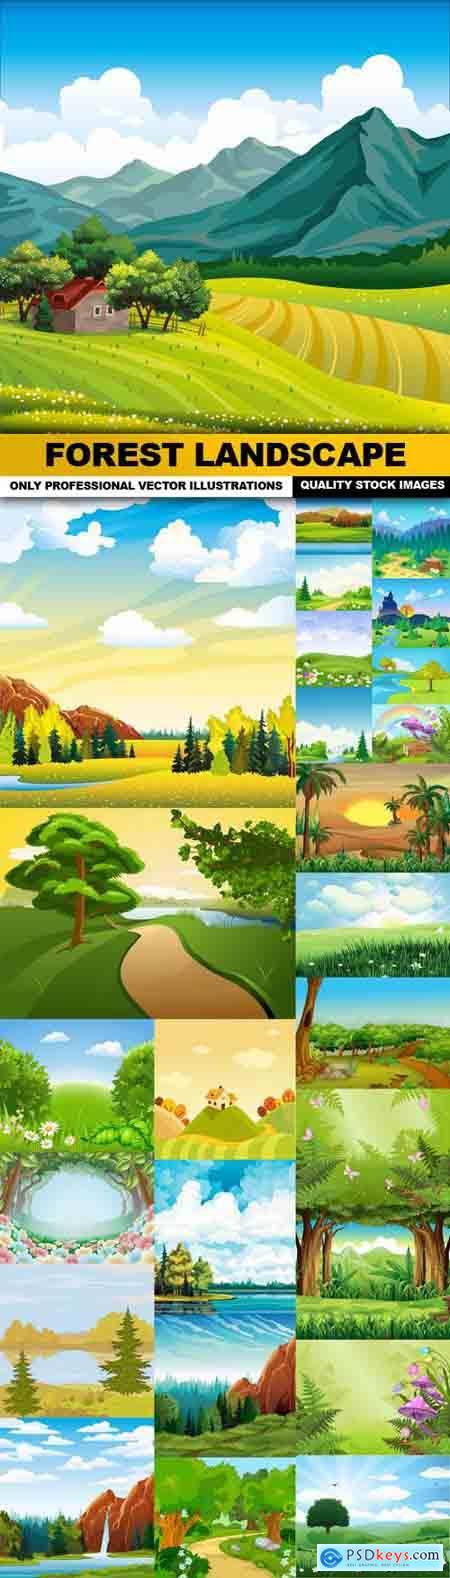 Forest Landscape - 27 Vector